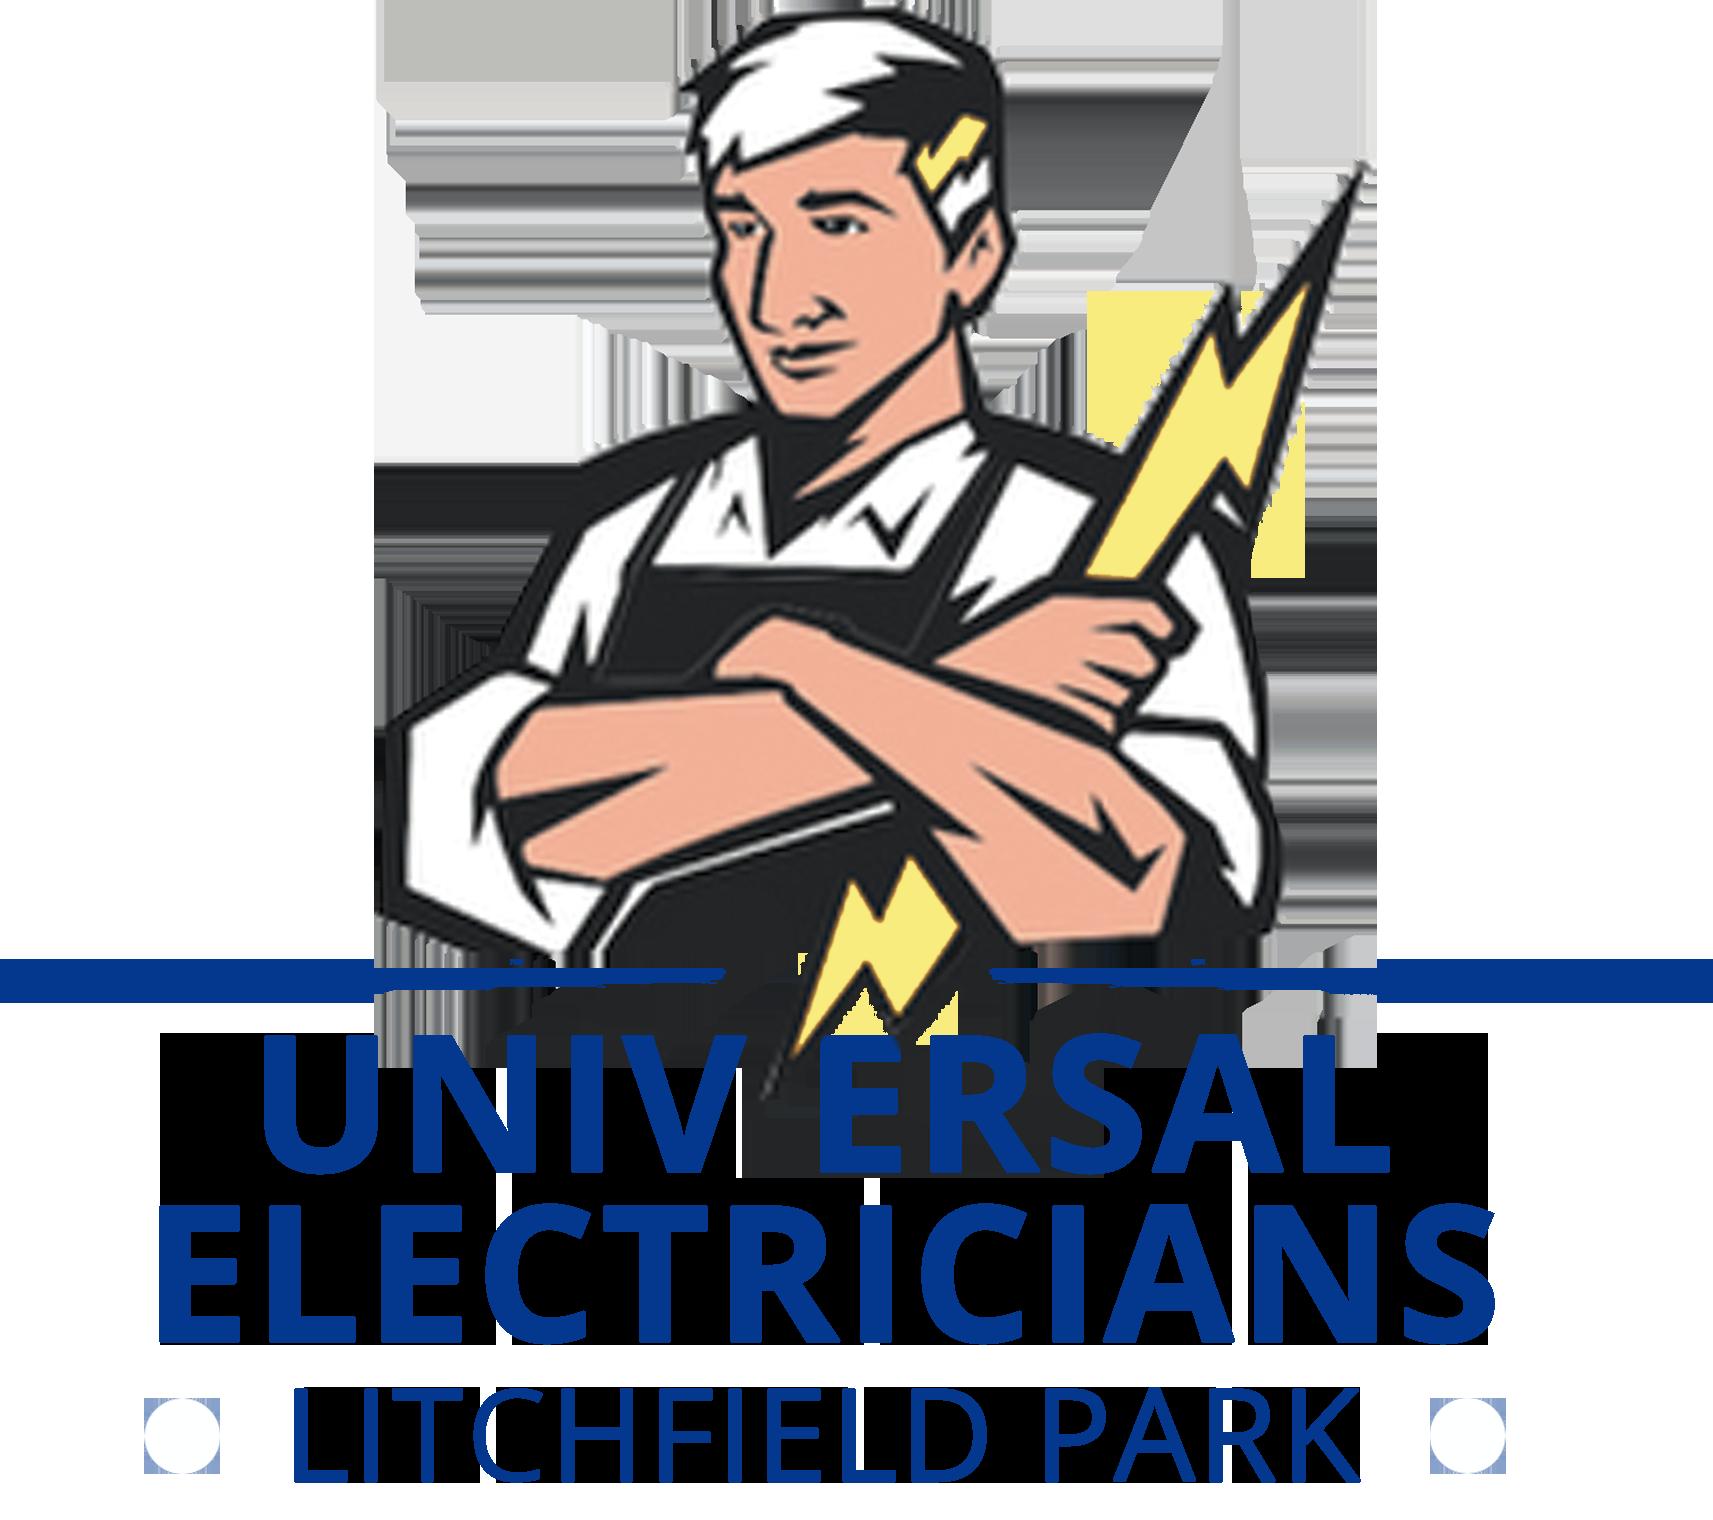 Contractor clipart electrical contractor. Electrician litchfield park az